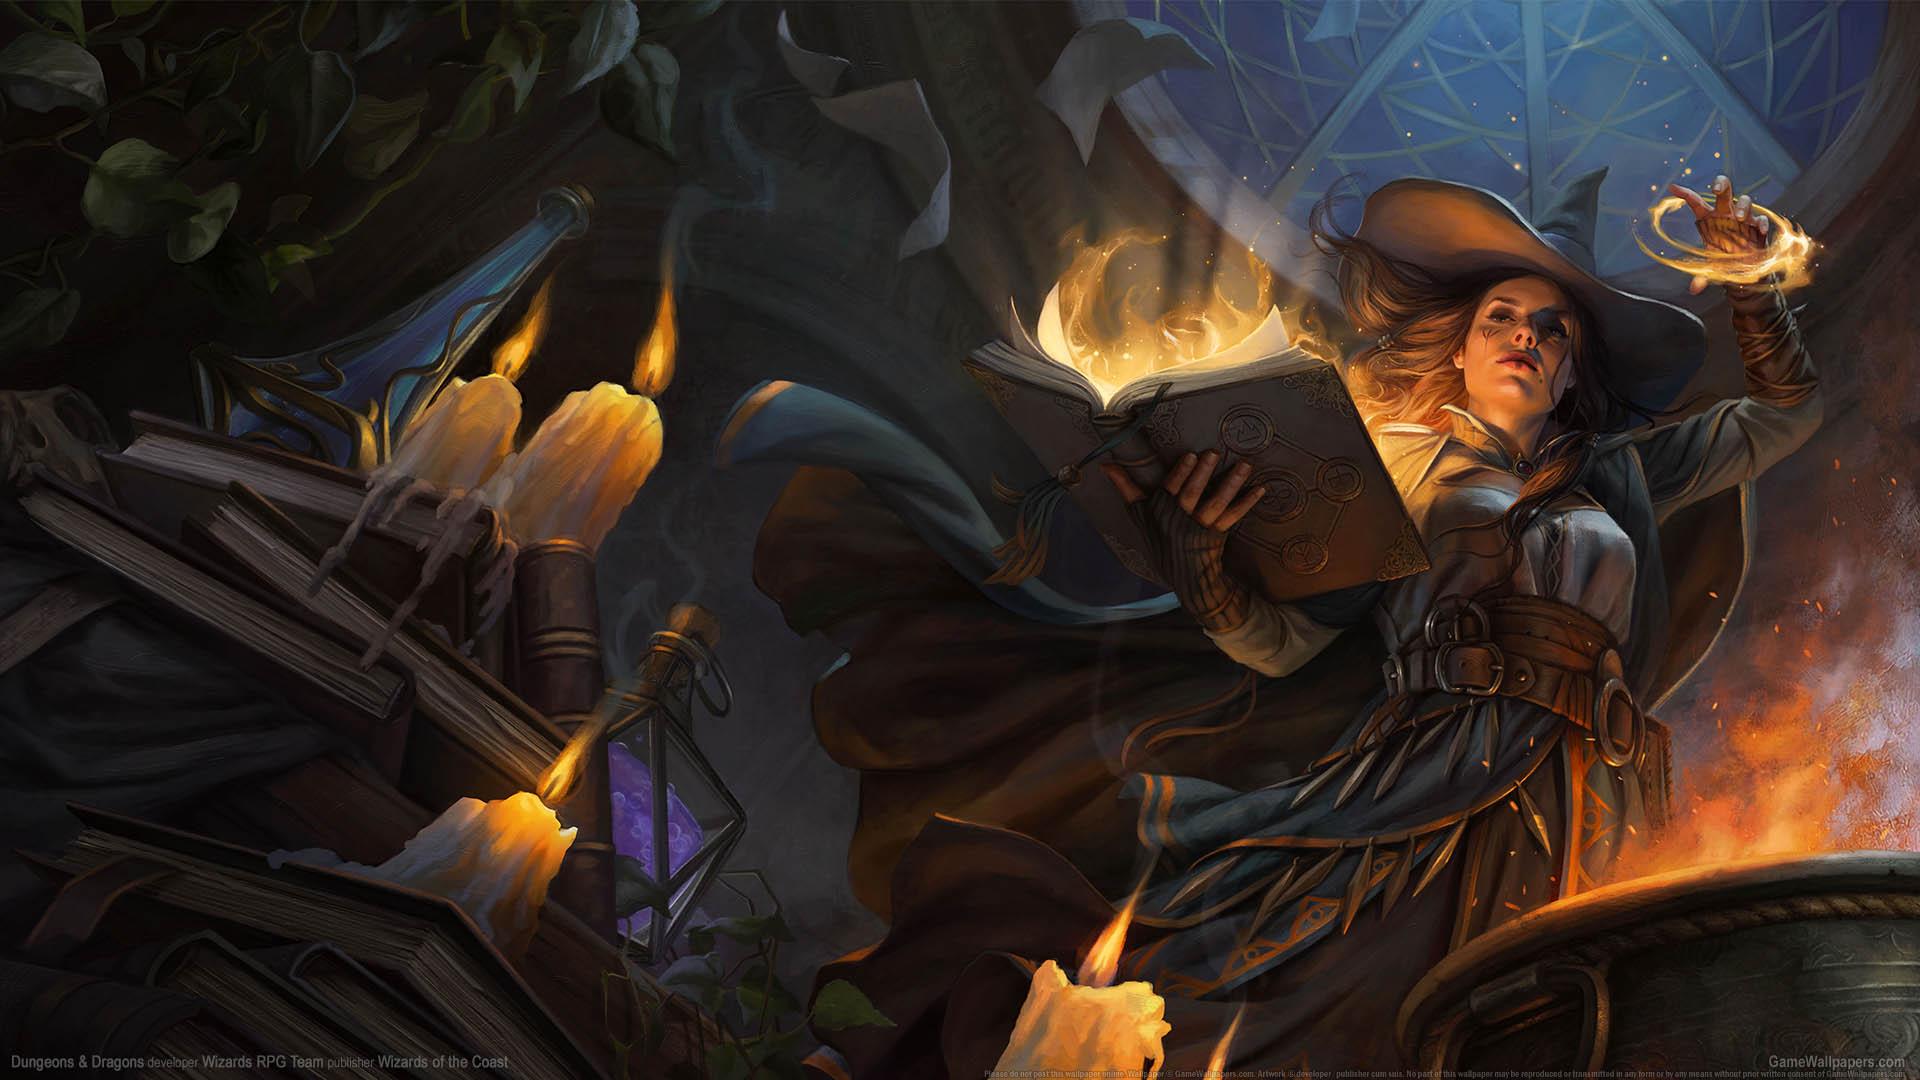 Dungeons & Dragons achtergrond 01 1920x1080